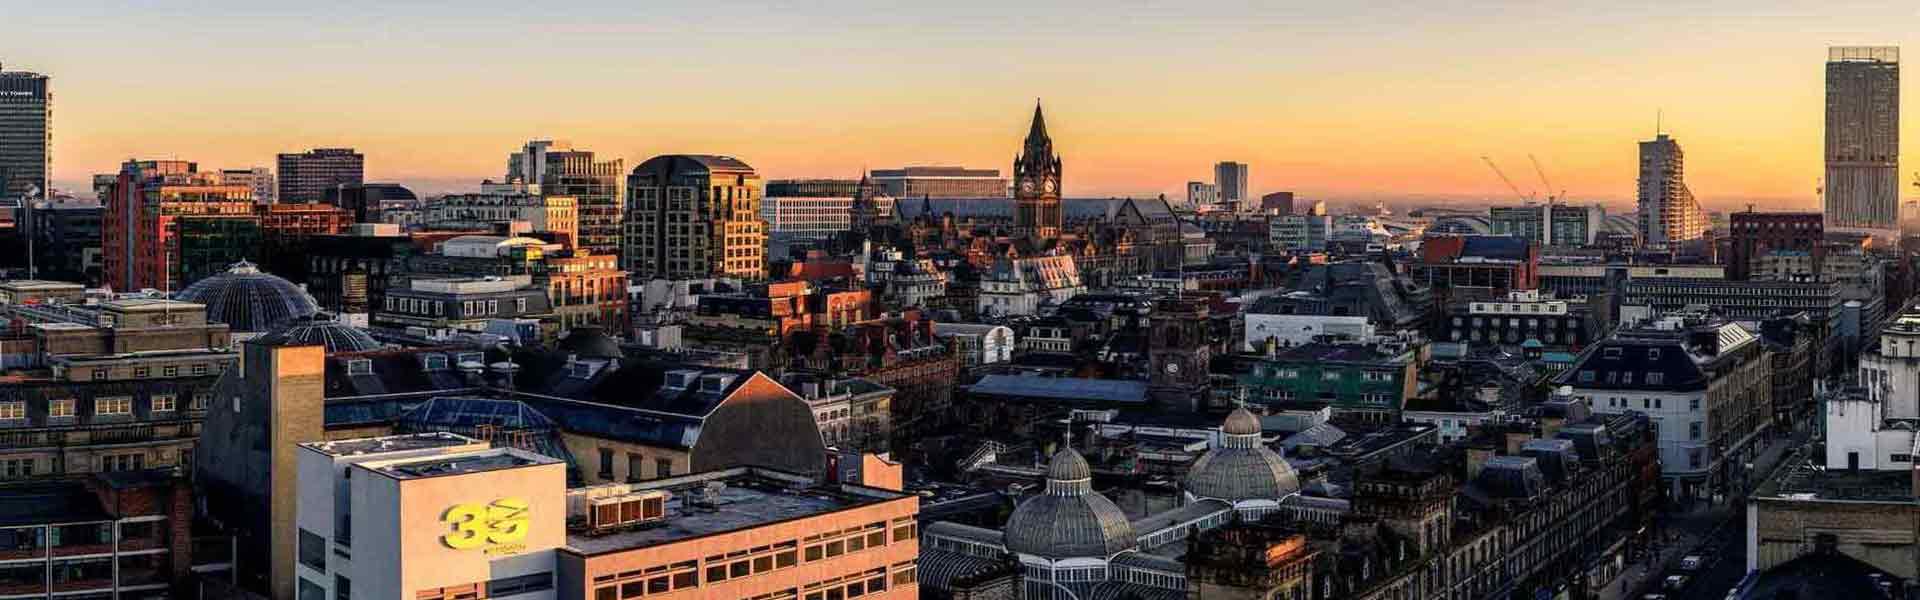 Skyline of Manchester, UK